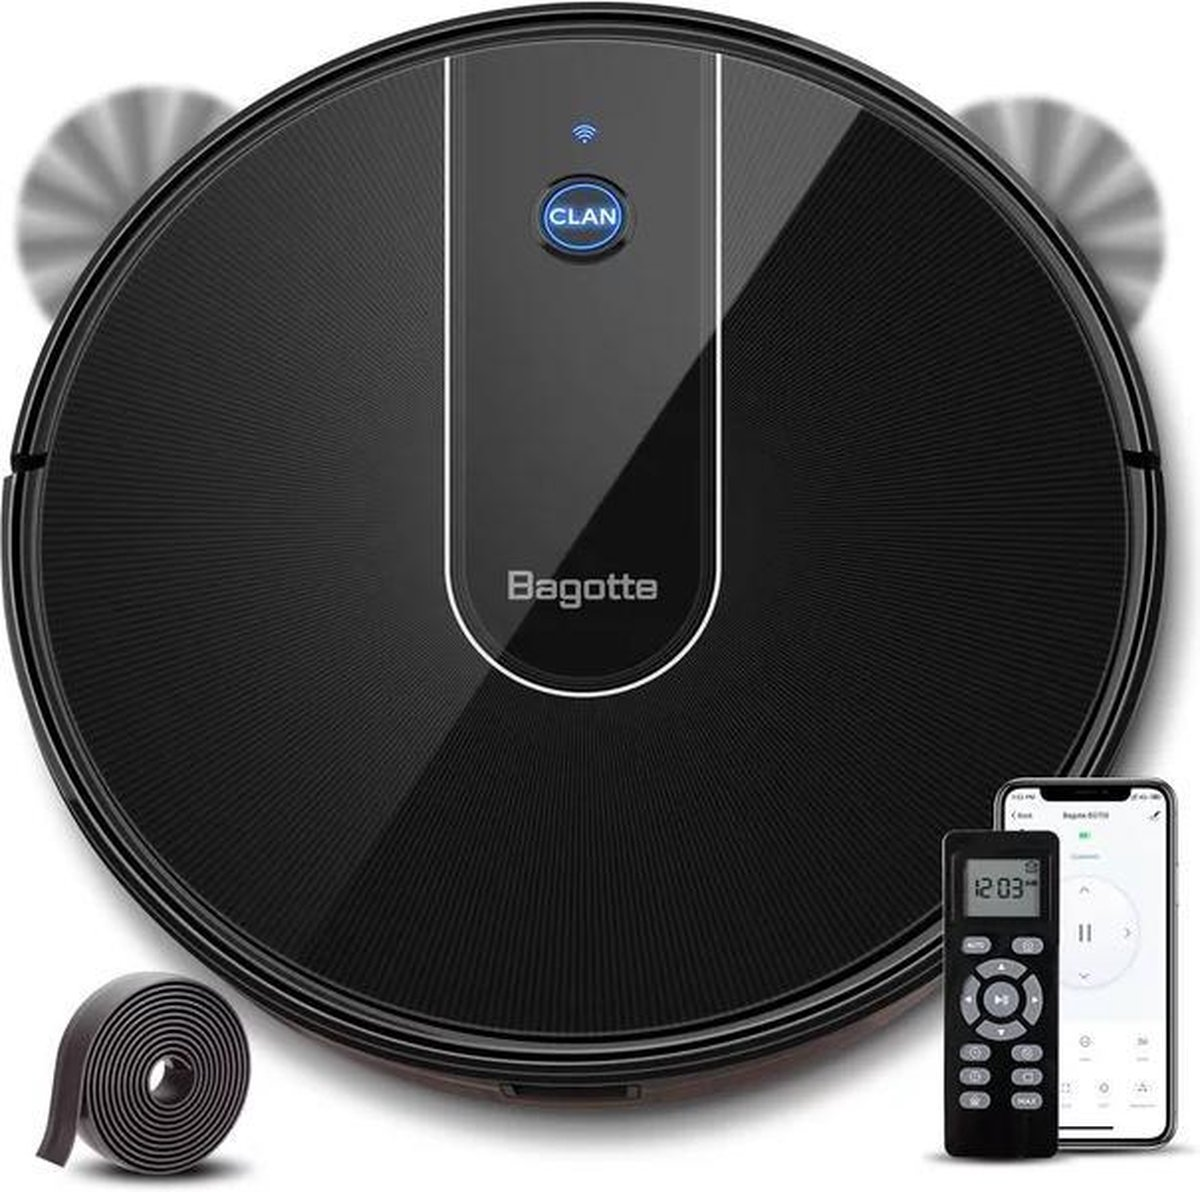 Bagotte BG700 Serie - Robotstofzuiger - Stofzuigrobot - WIFI bestuurbaar - Met afstandsbediening en mobiele App - Zwart